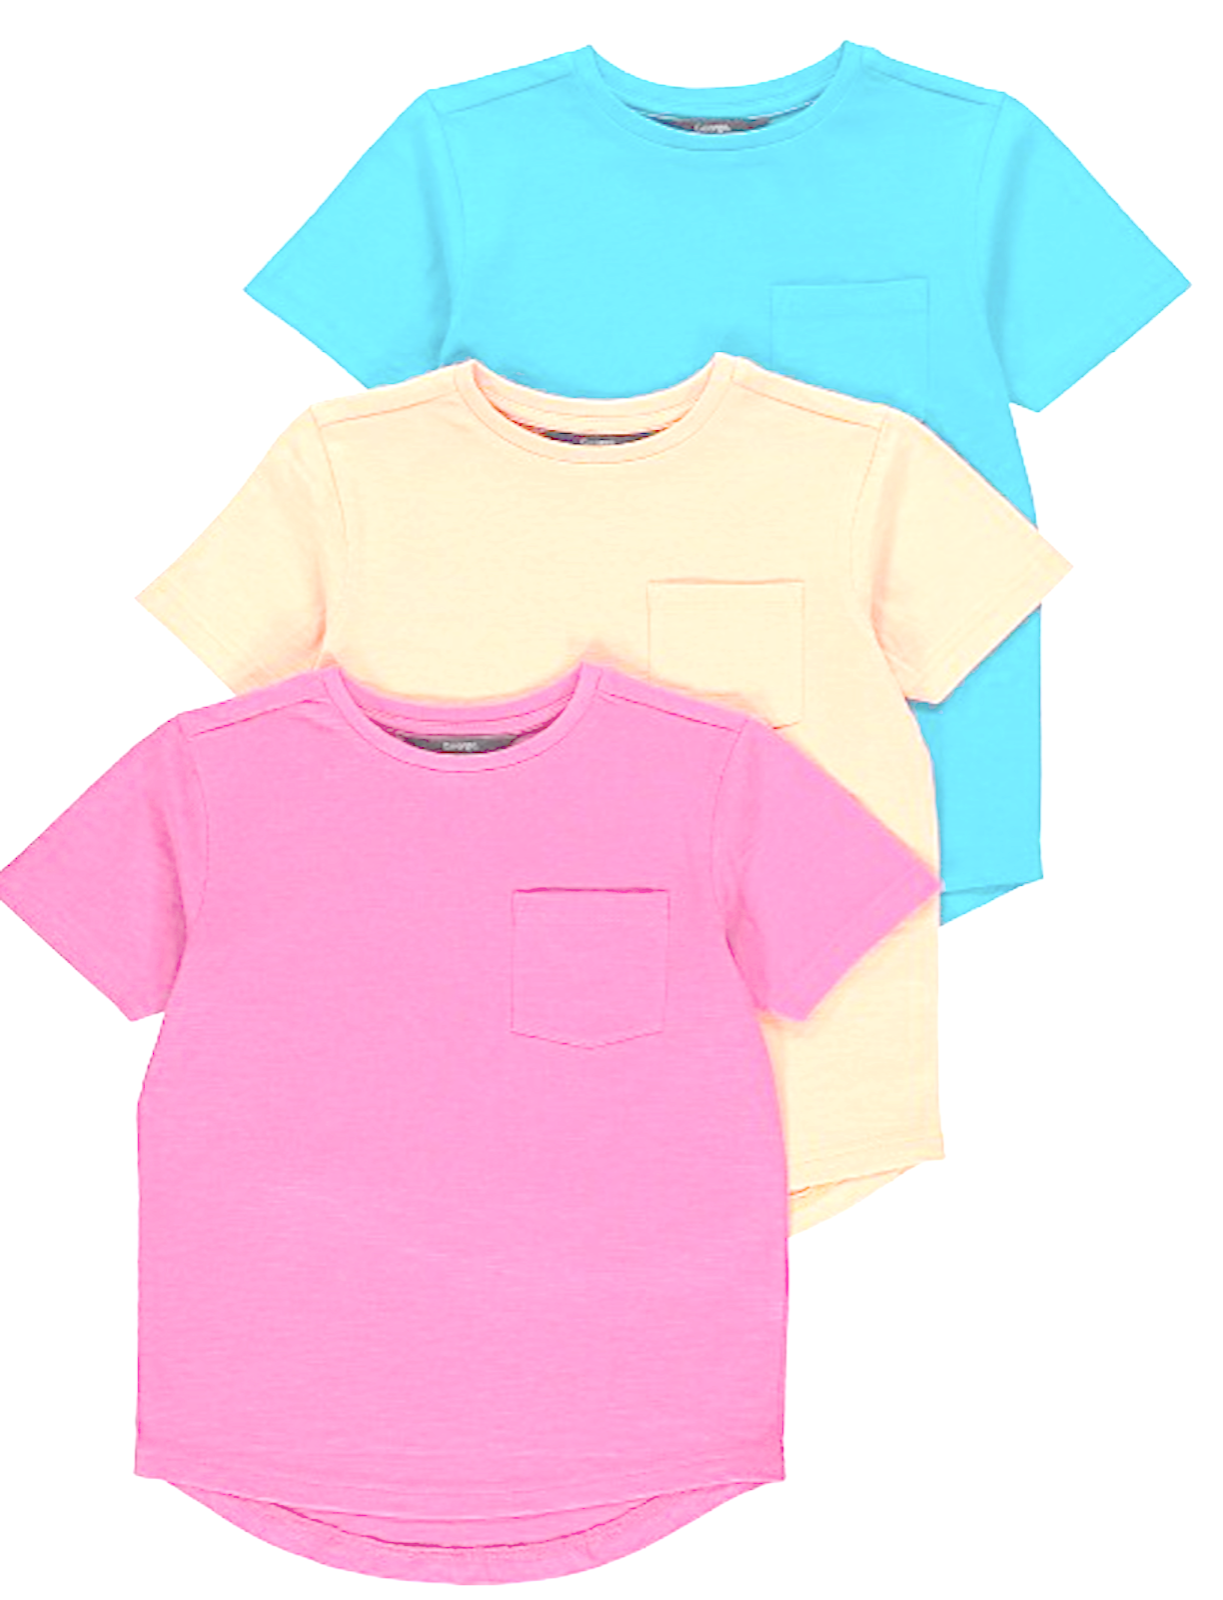 Kids Boys/Girls Unisex Crew Neck Short Sleeves T-Shirt Top 100% Cotton 5 to10YRS 2